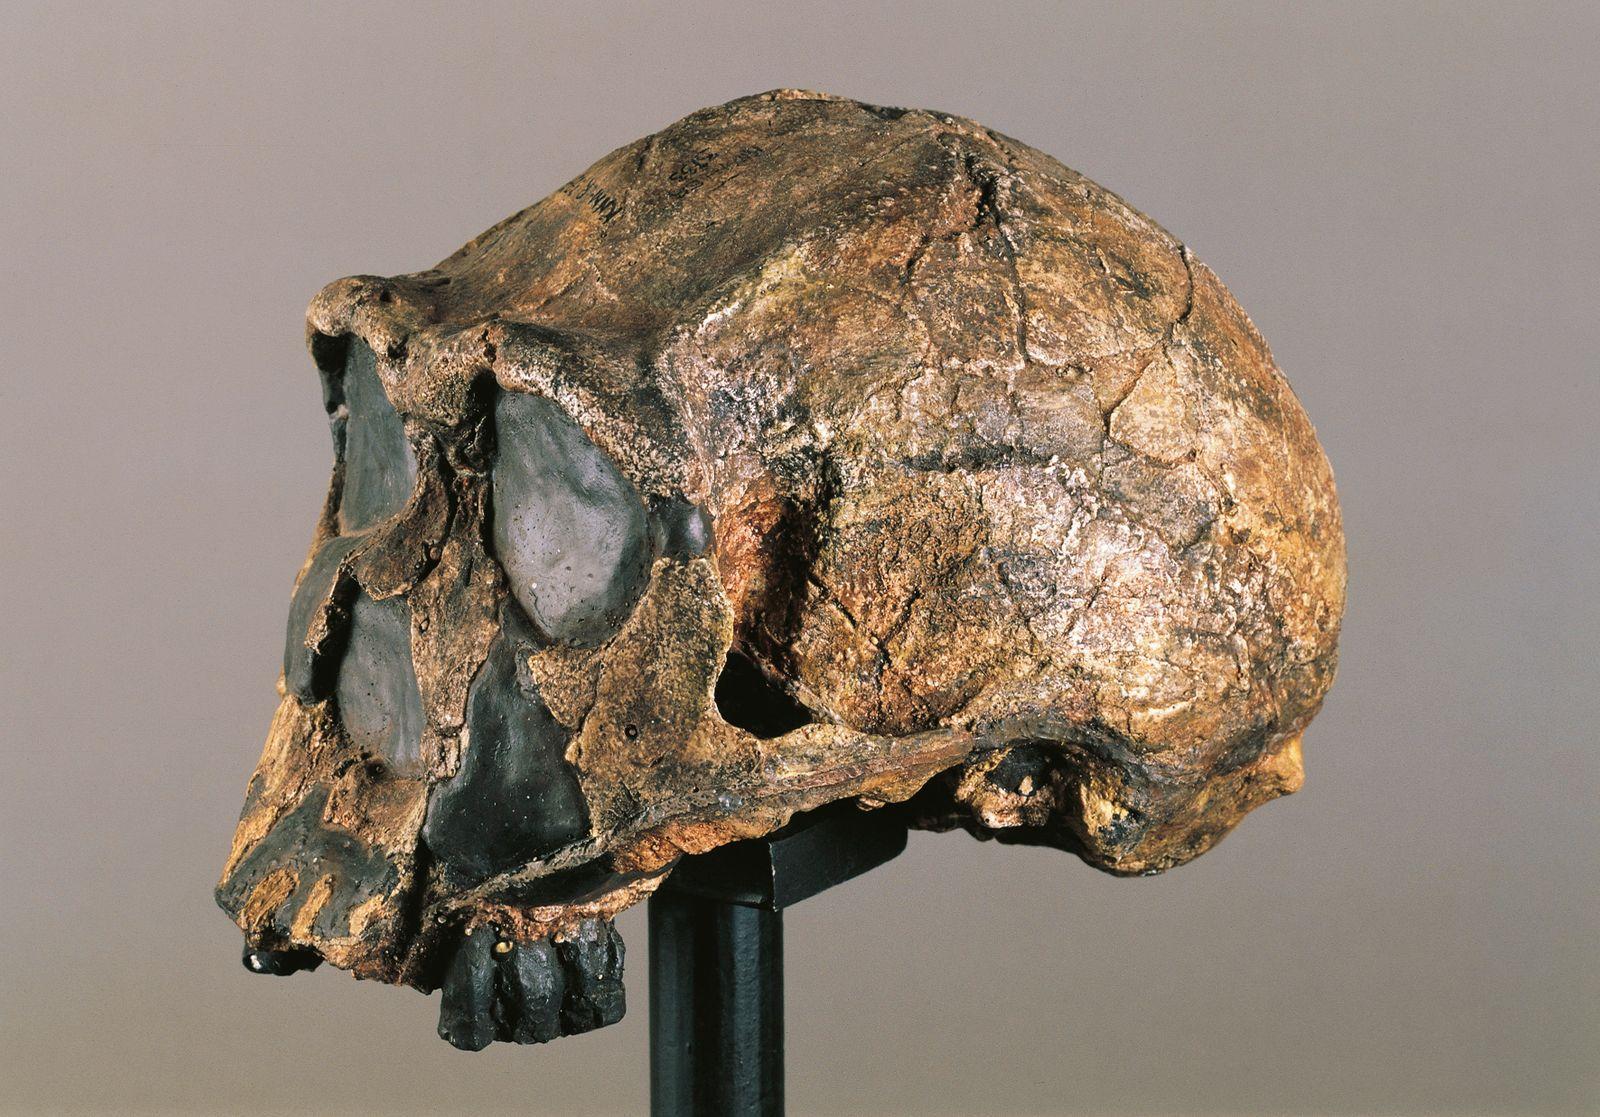 Skull of Homo erectus, from Kenya